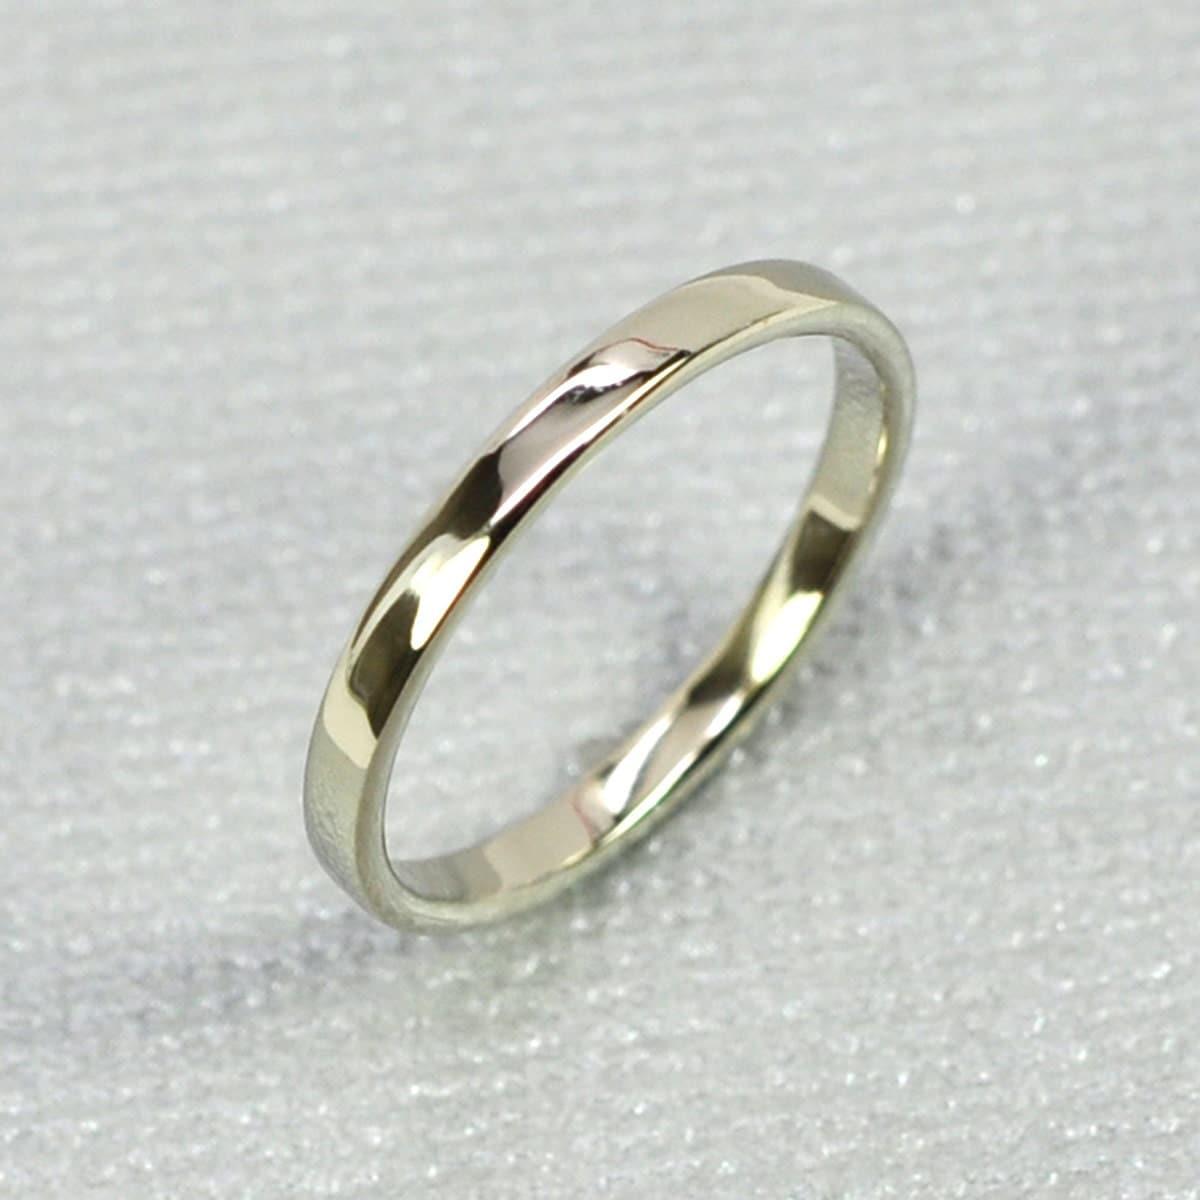 White Gold Wedding Band 14K White Gold Skinny Ring 2mm Sea